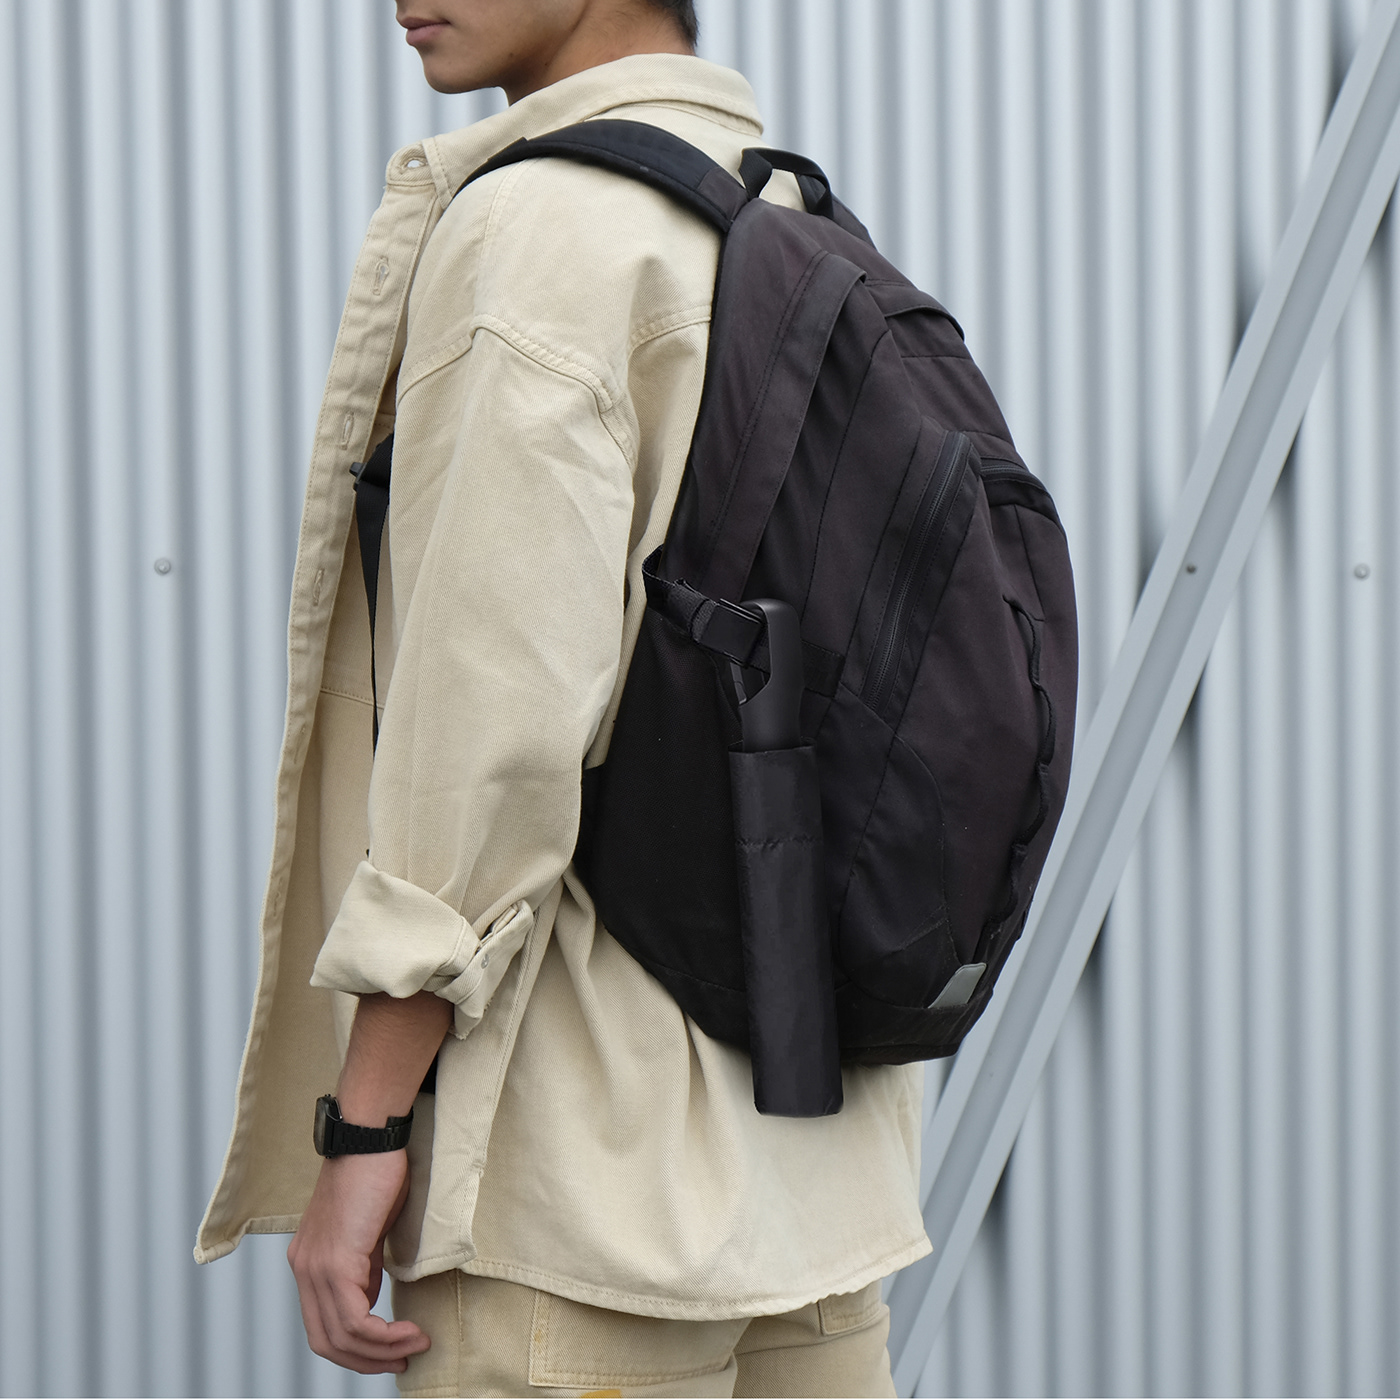 Image may contain: luggage and bags, person and handbag